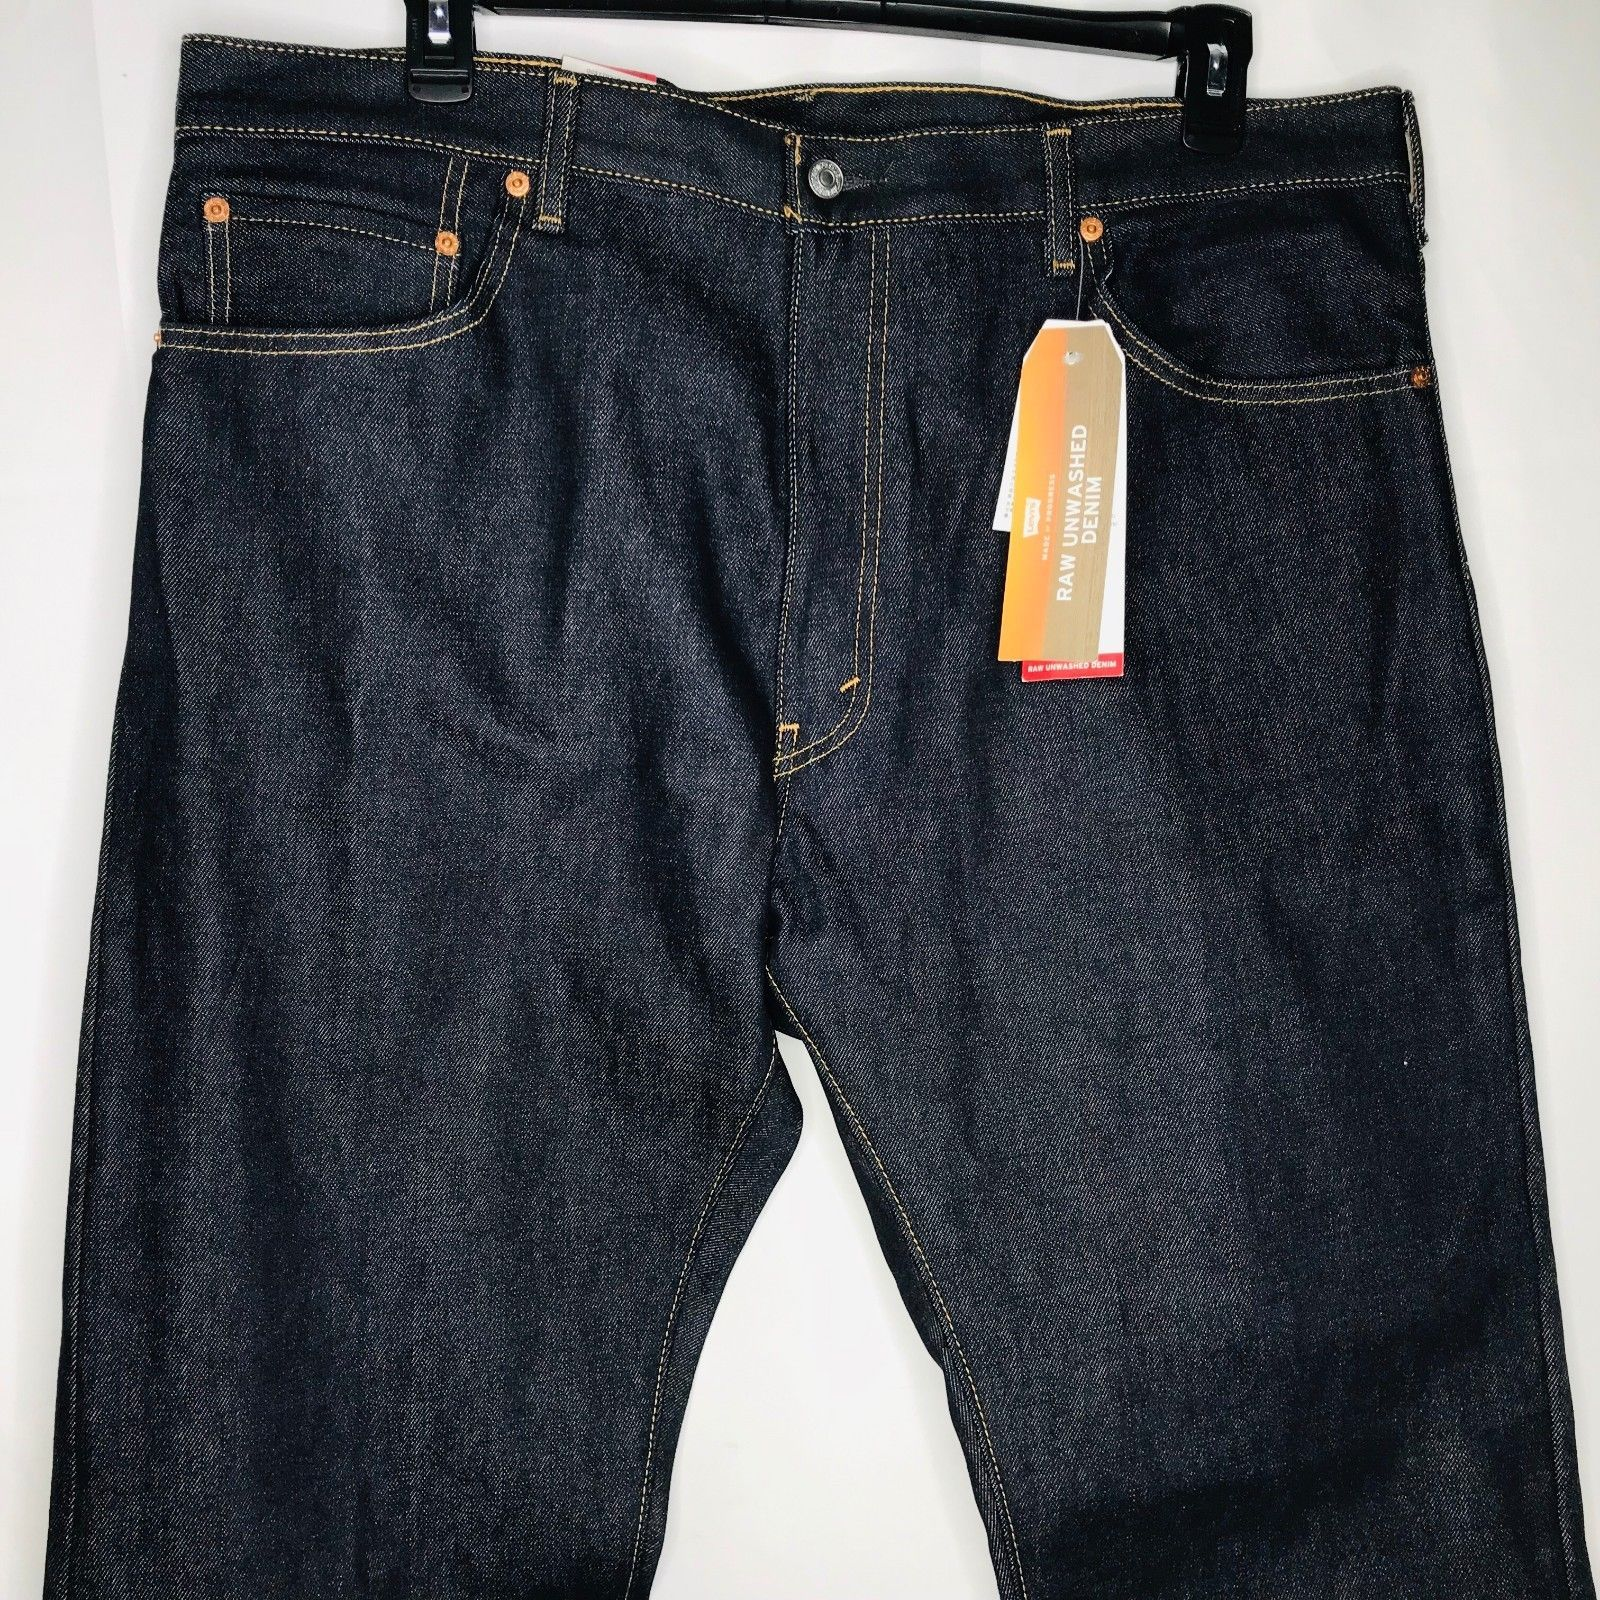 9d70b8d3e39 Levi's Mens 517-0217 Bootcut Boot Leg Jeans and 40 similar items. 57